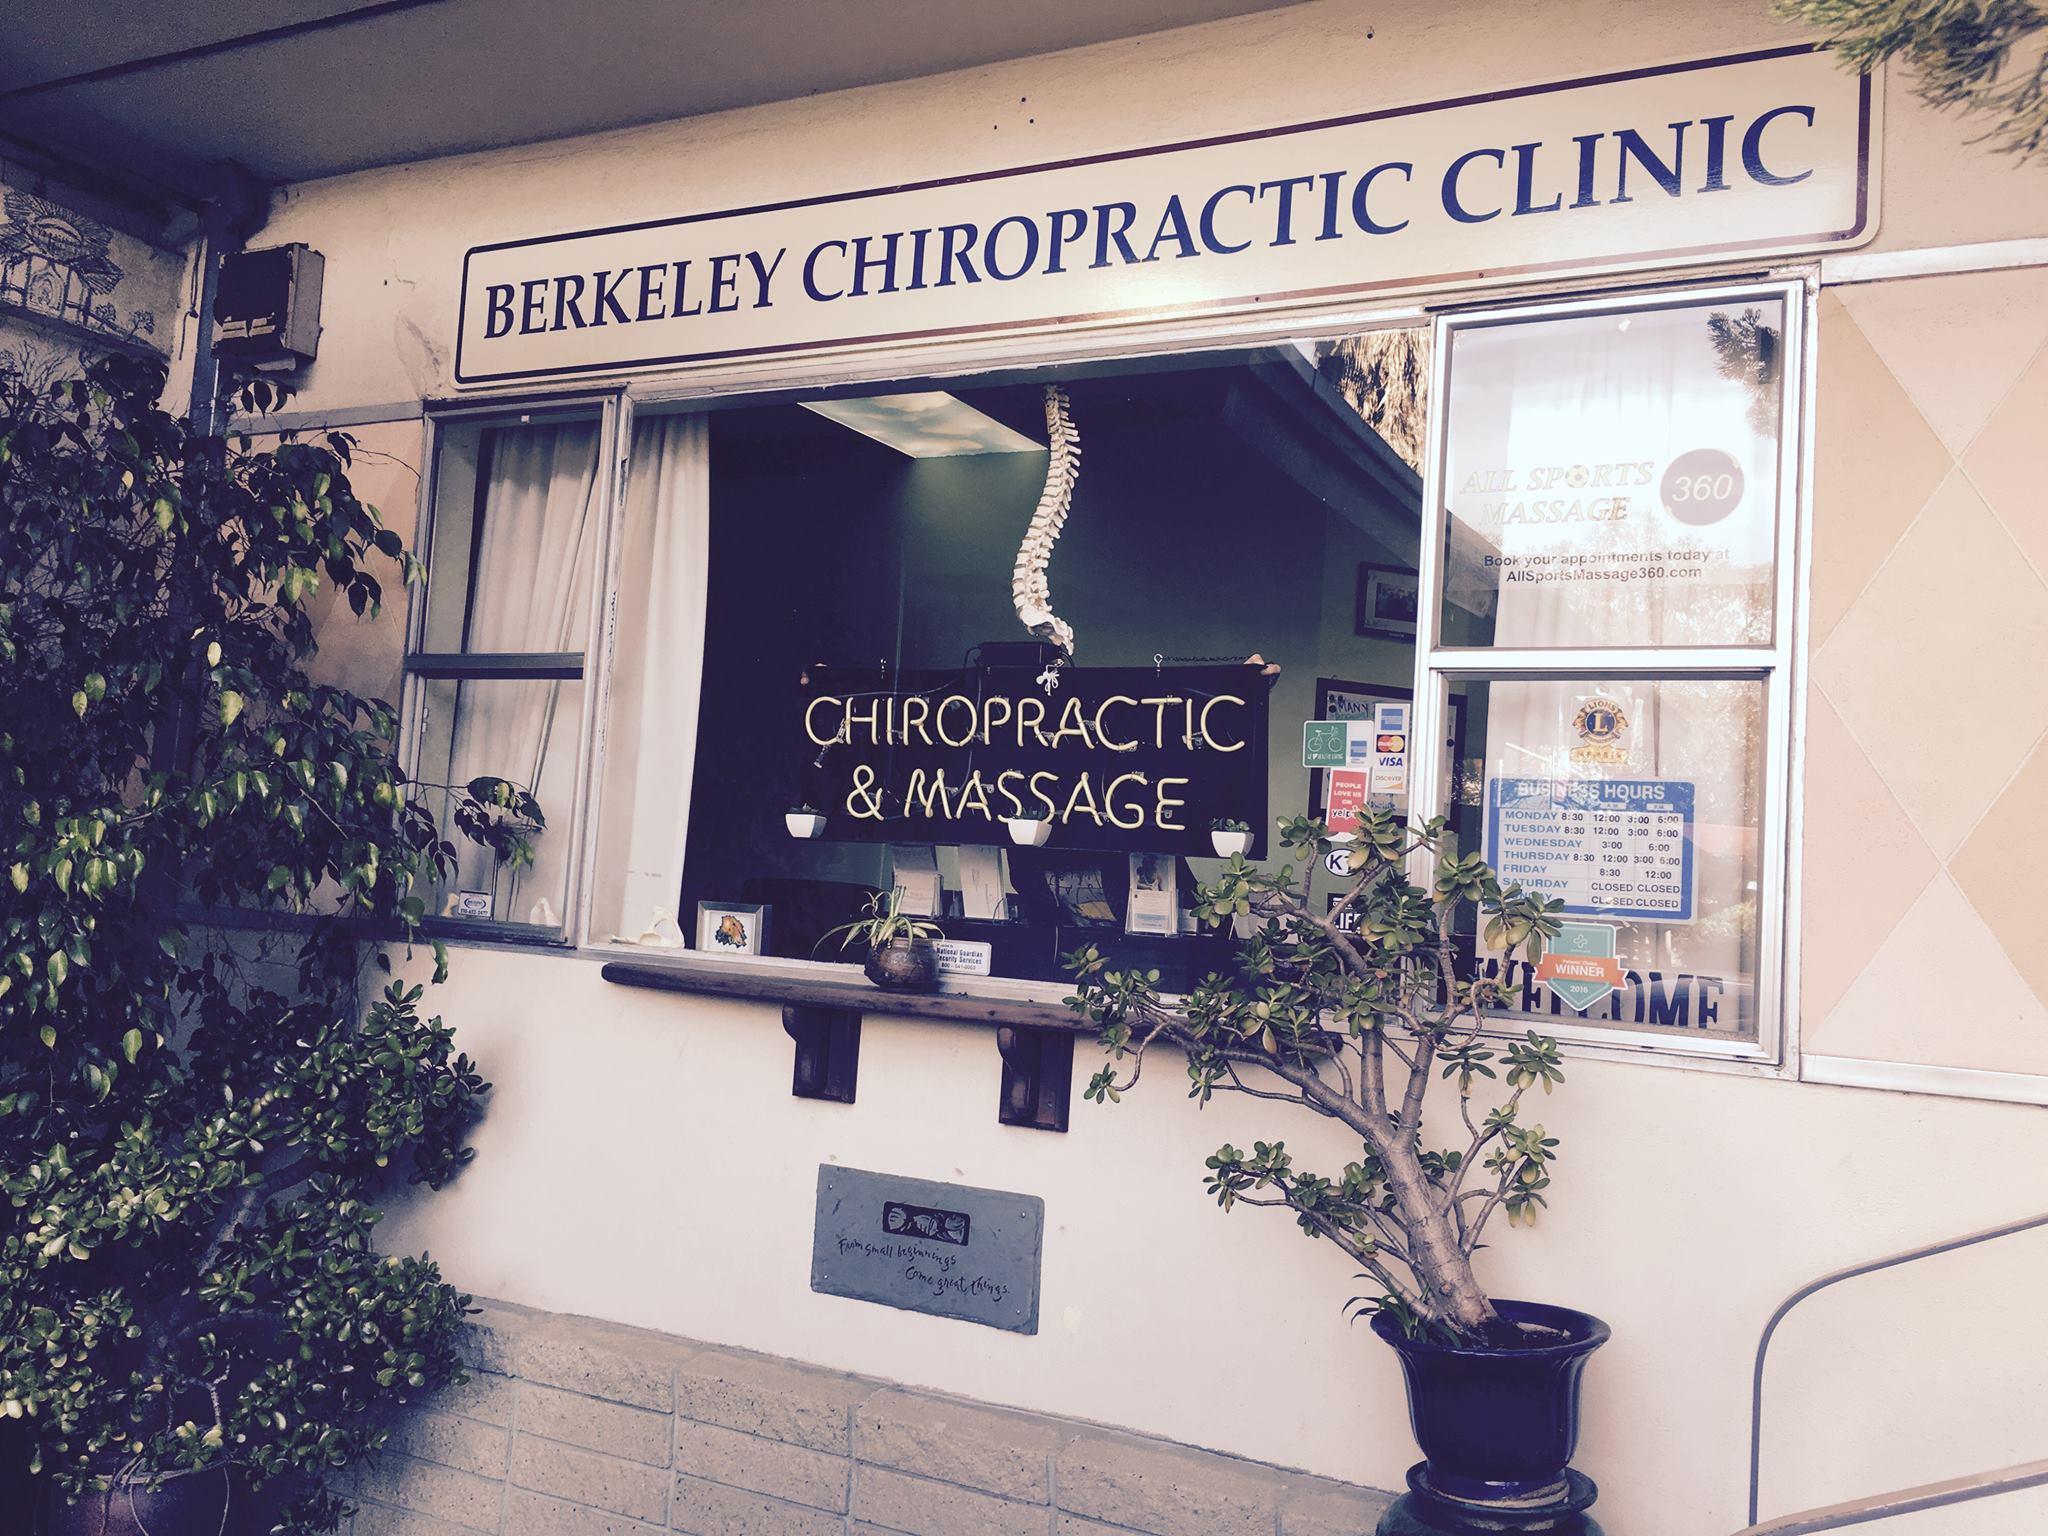 Berkeley Chiropractic - Chiropractic care, Corrective exercises, lifestyle advice